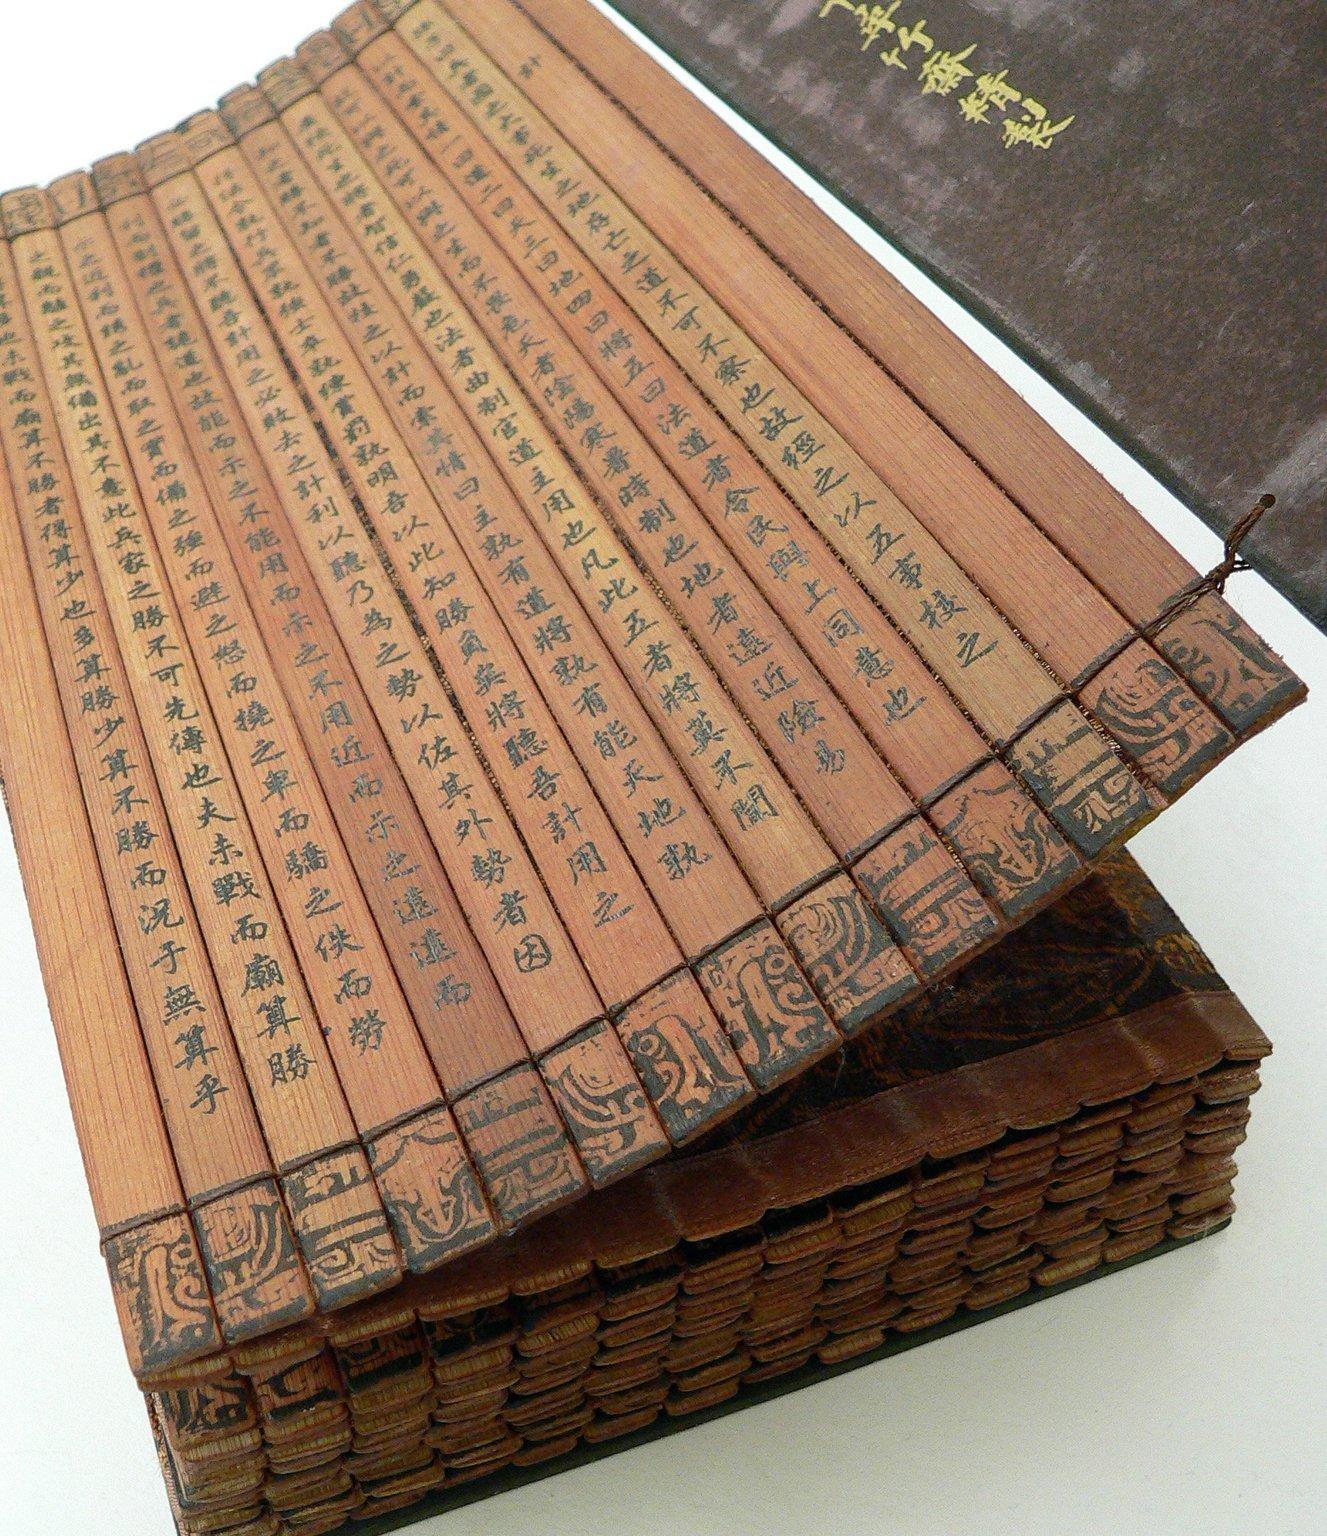 Bamboo_book_-_binding_-_UCR